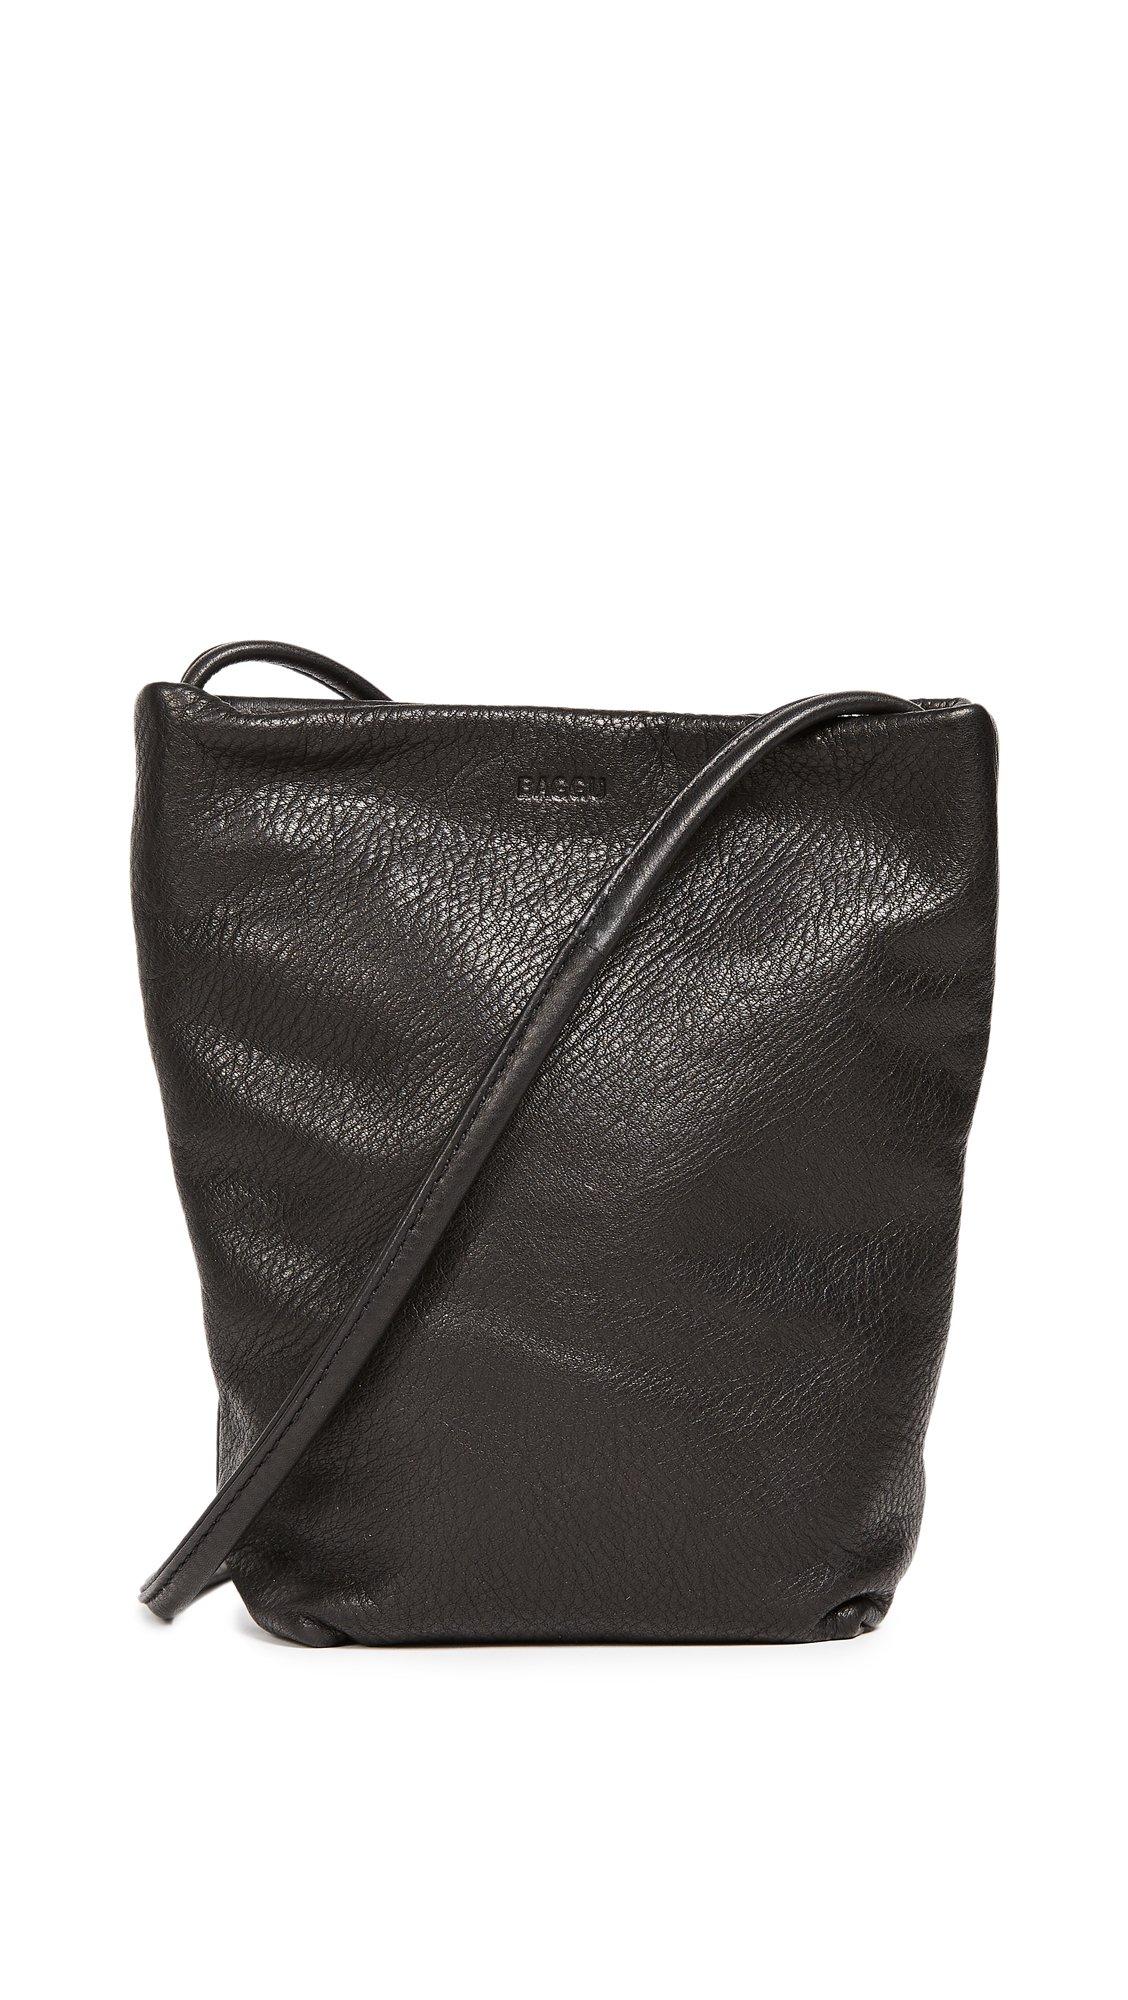 BAGGU Women's Cross Body Bag, Black, One Size by BAGGU